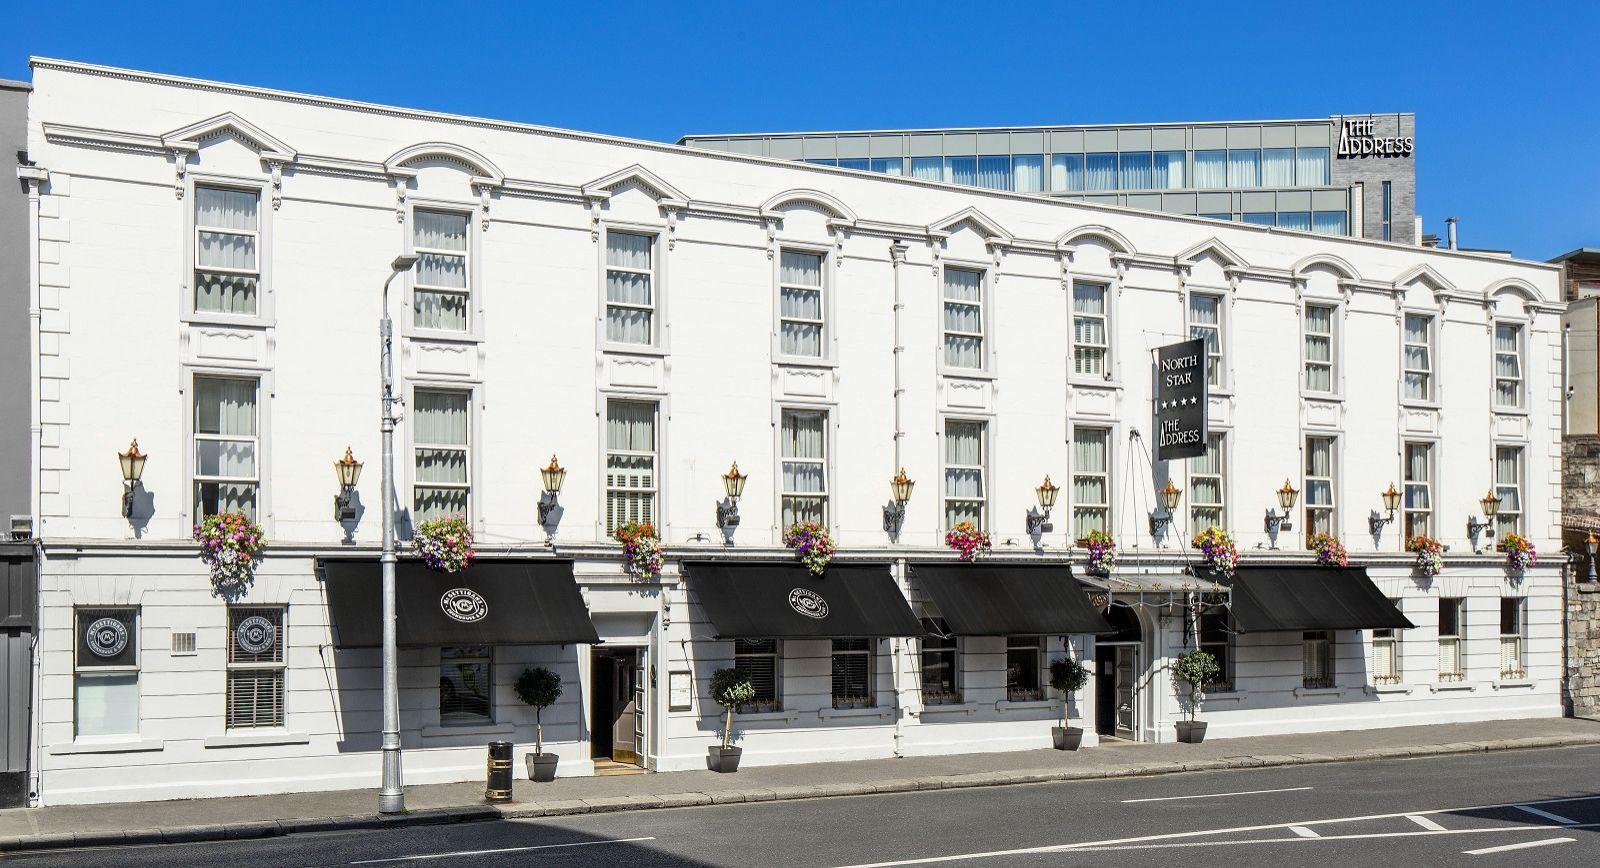 North Star Hotel